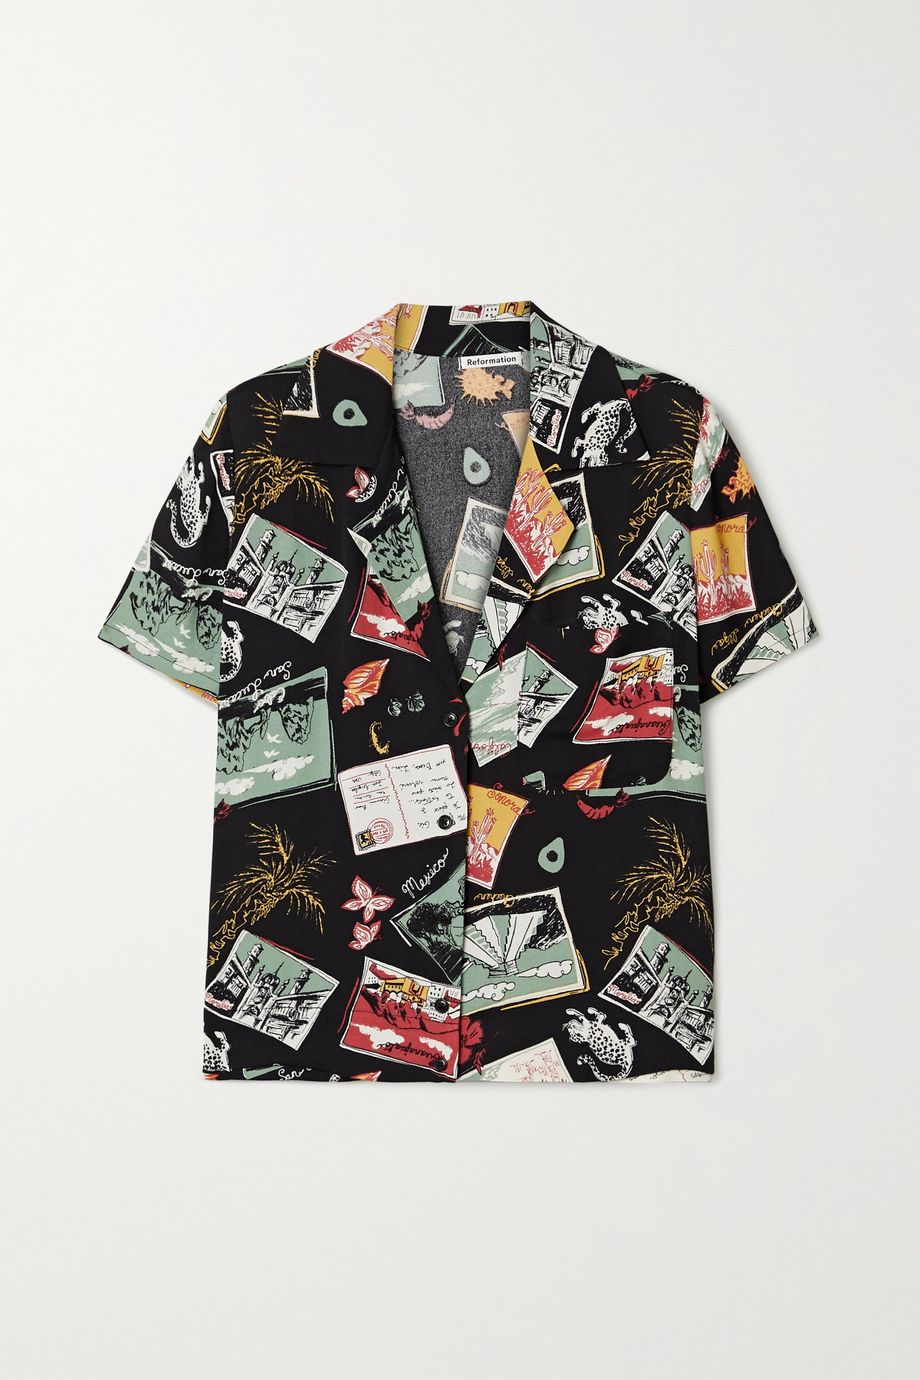 Reformation Cuba printed crepe shirt